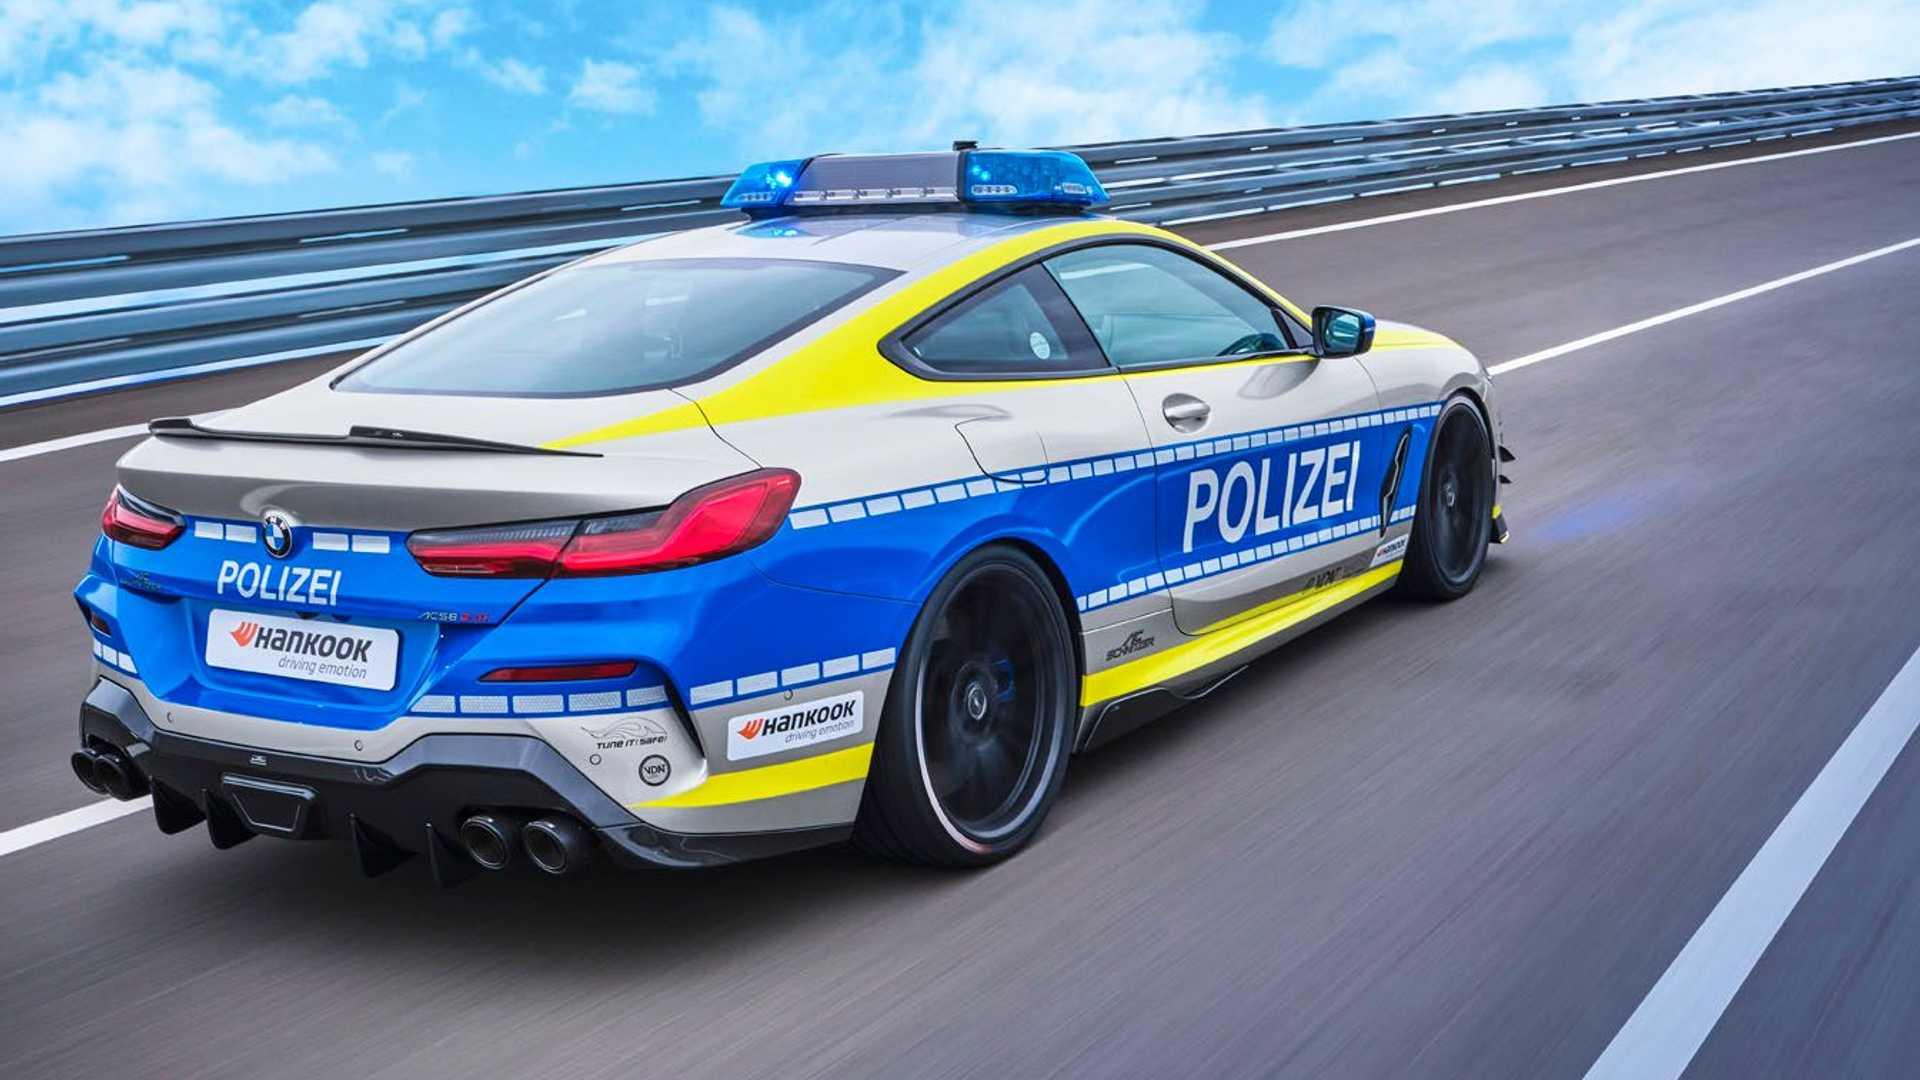 BMW-M850i-police-car-tune-it-safe-28